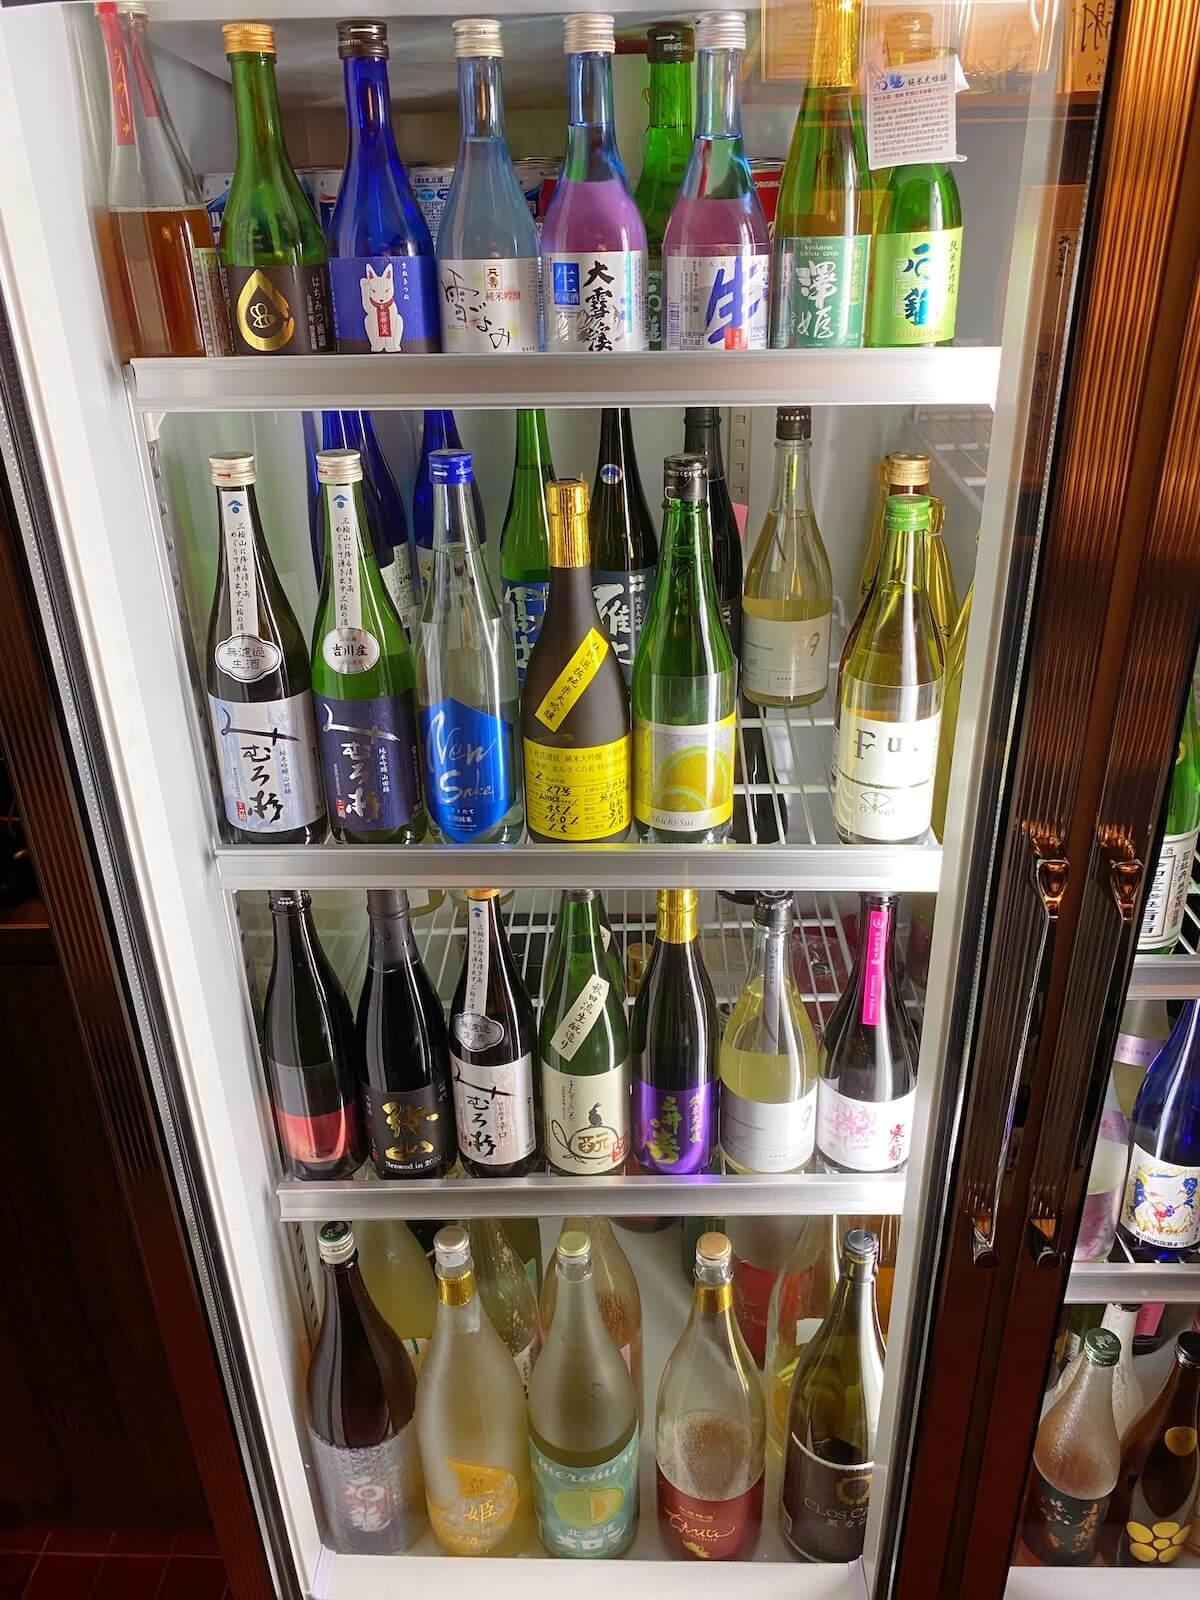 Sake refrigerator (left)